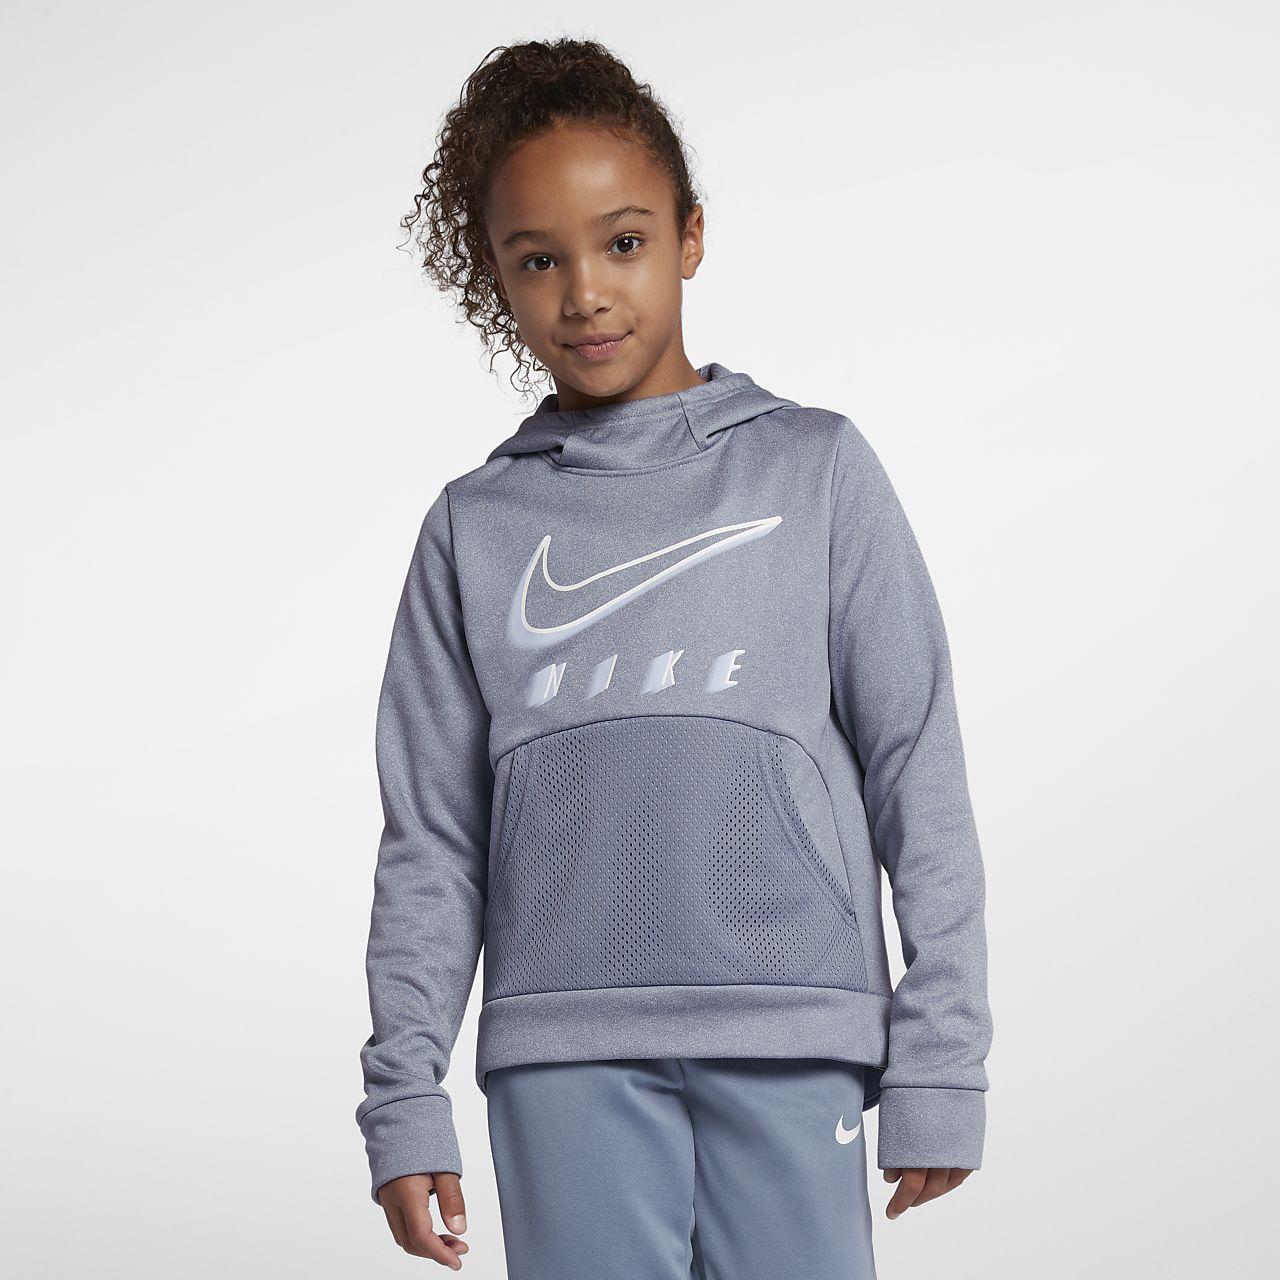 7fcfc6d848 Nike Therma Big Kids' (Girls') Training Pullover Hoodie. Nike.com